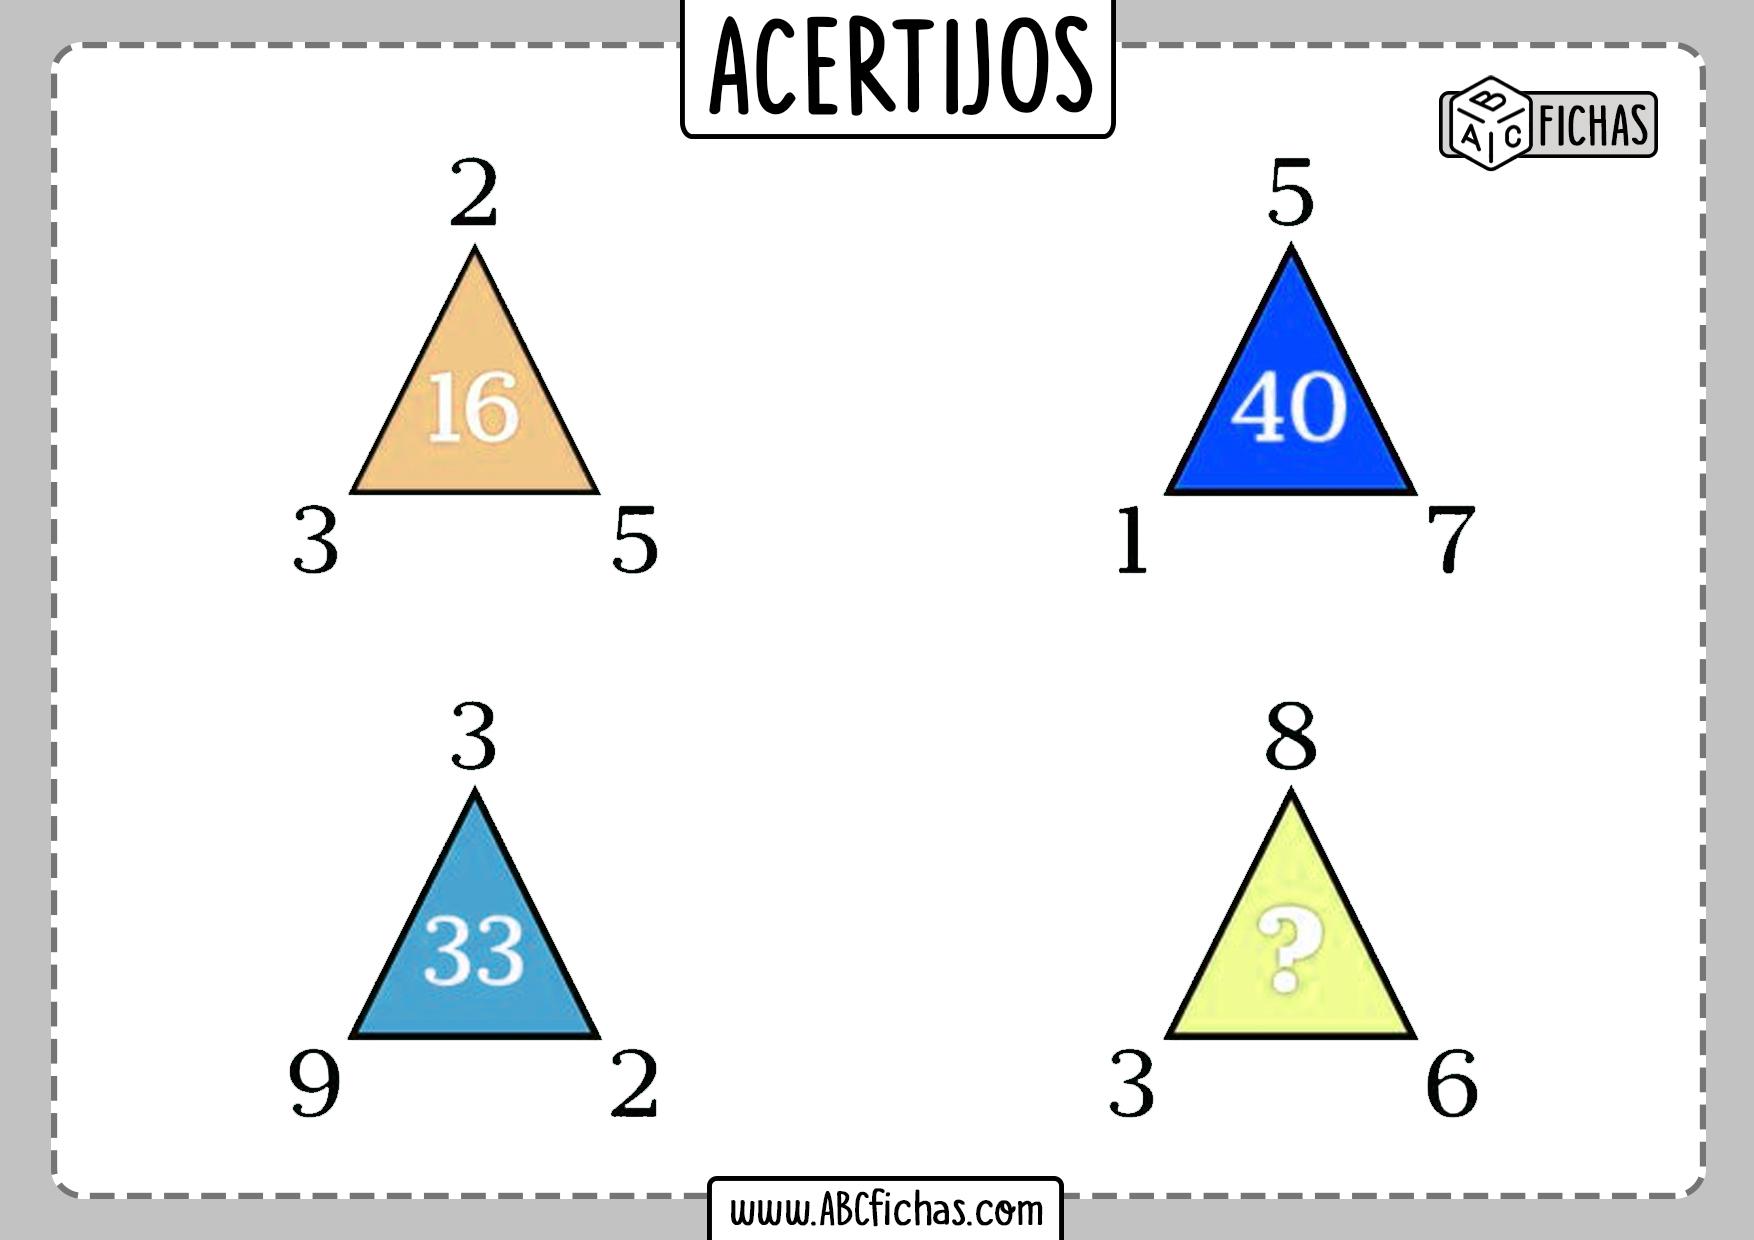 Acertijos matematicos con numeros